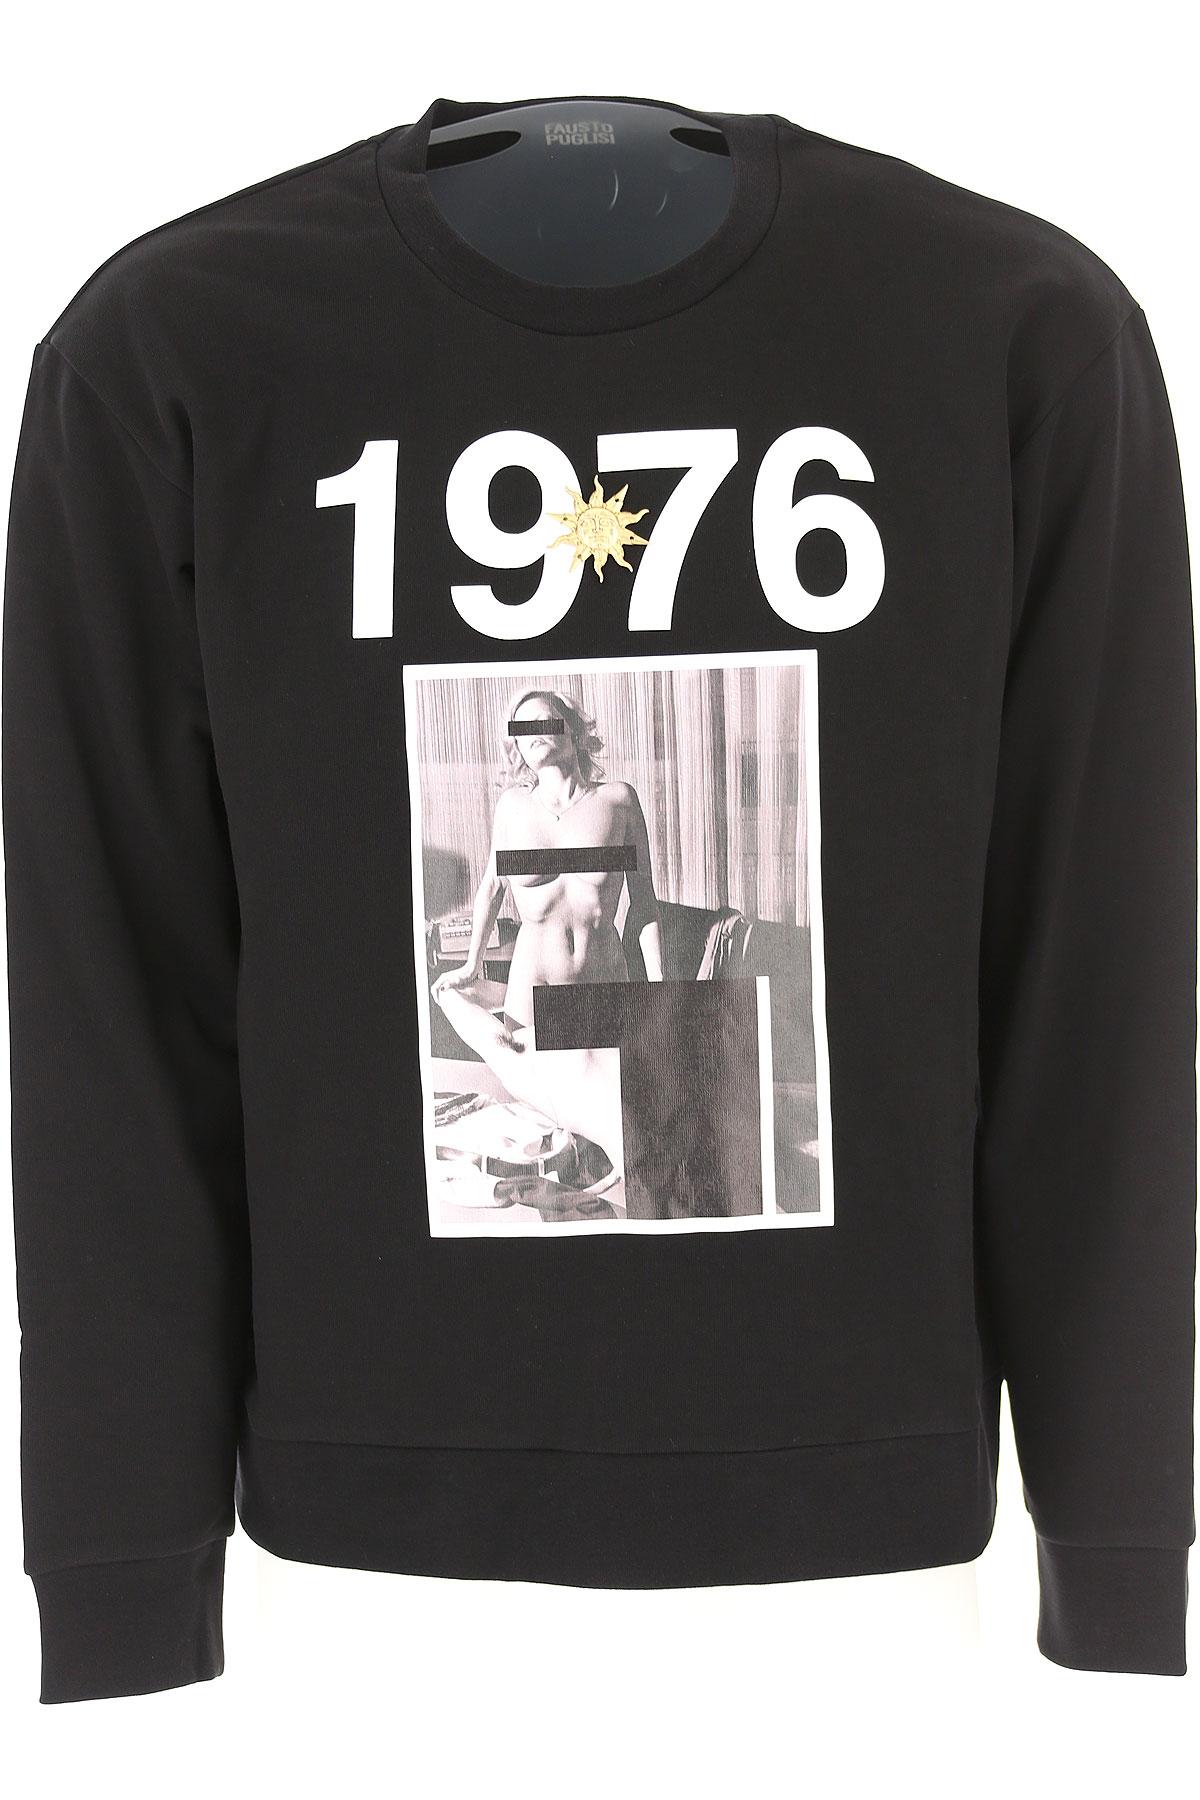 Image of Fausto Puglisi Sweatshirt for Men, Black, Cotton, 2017, L M XL